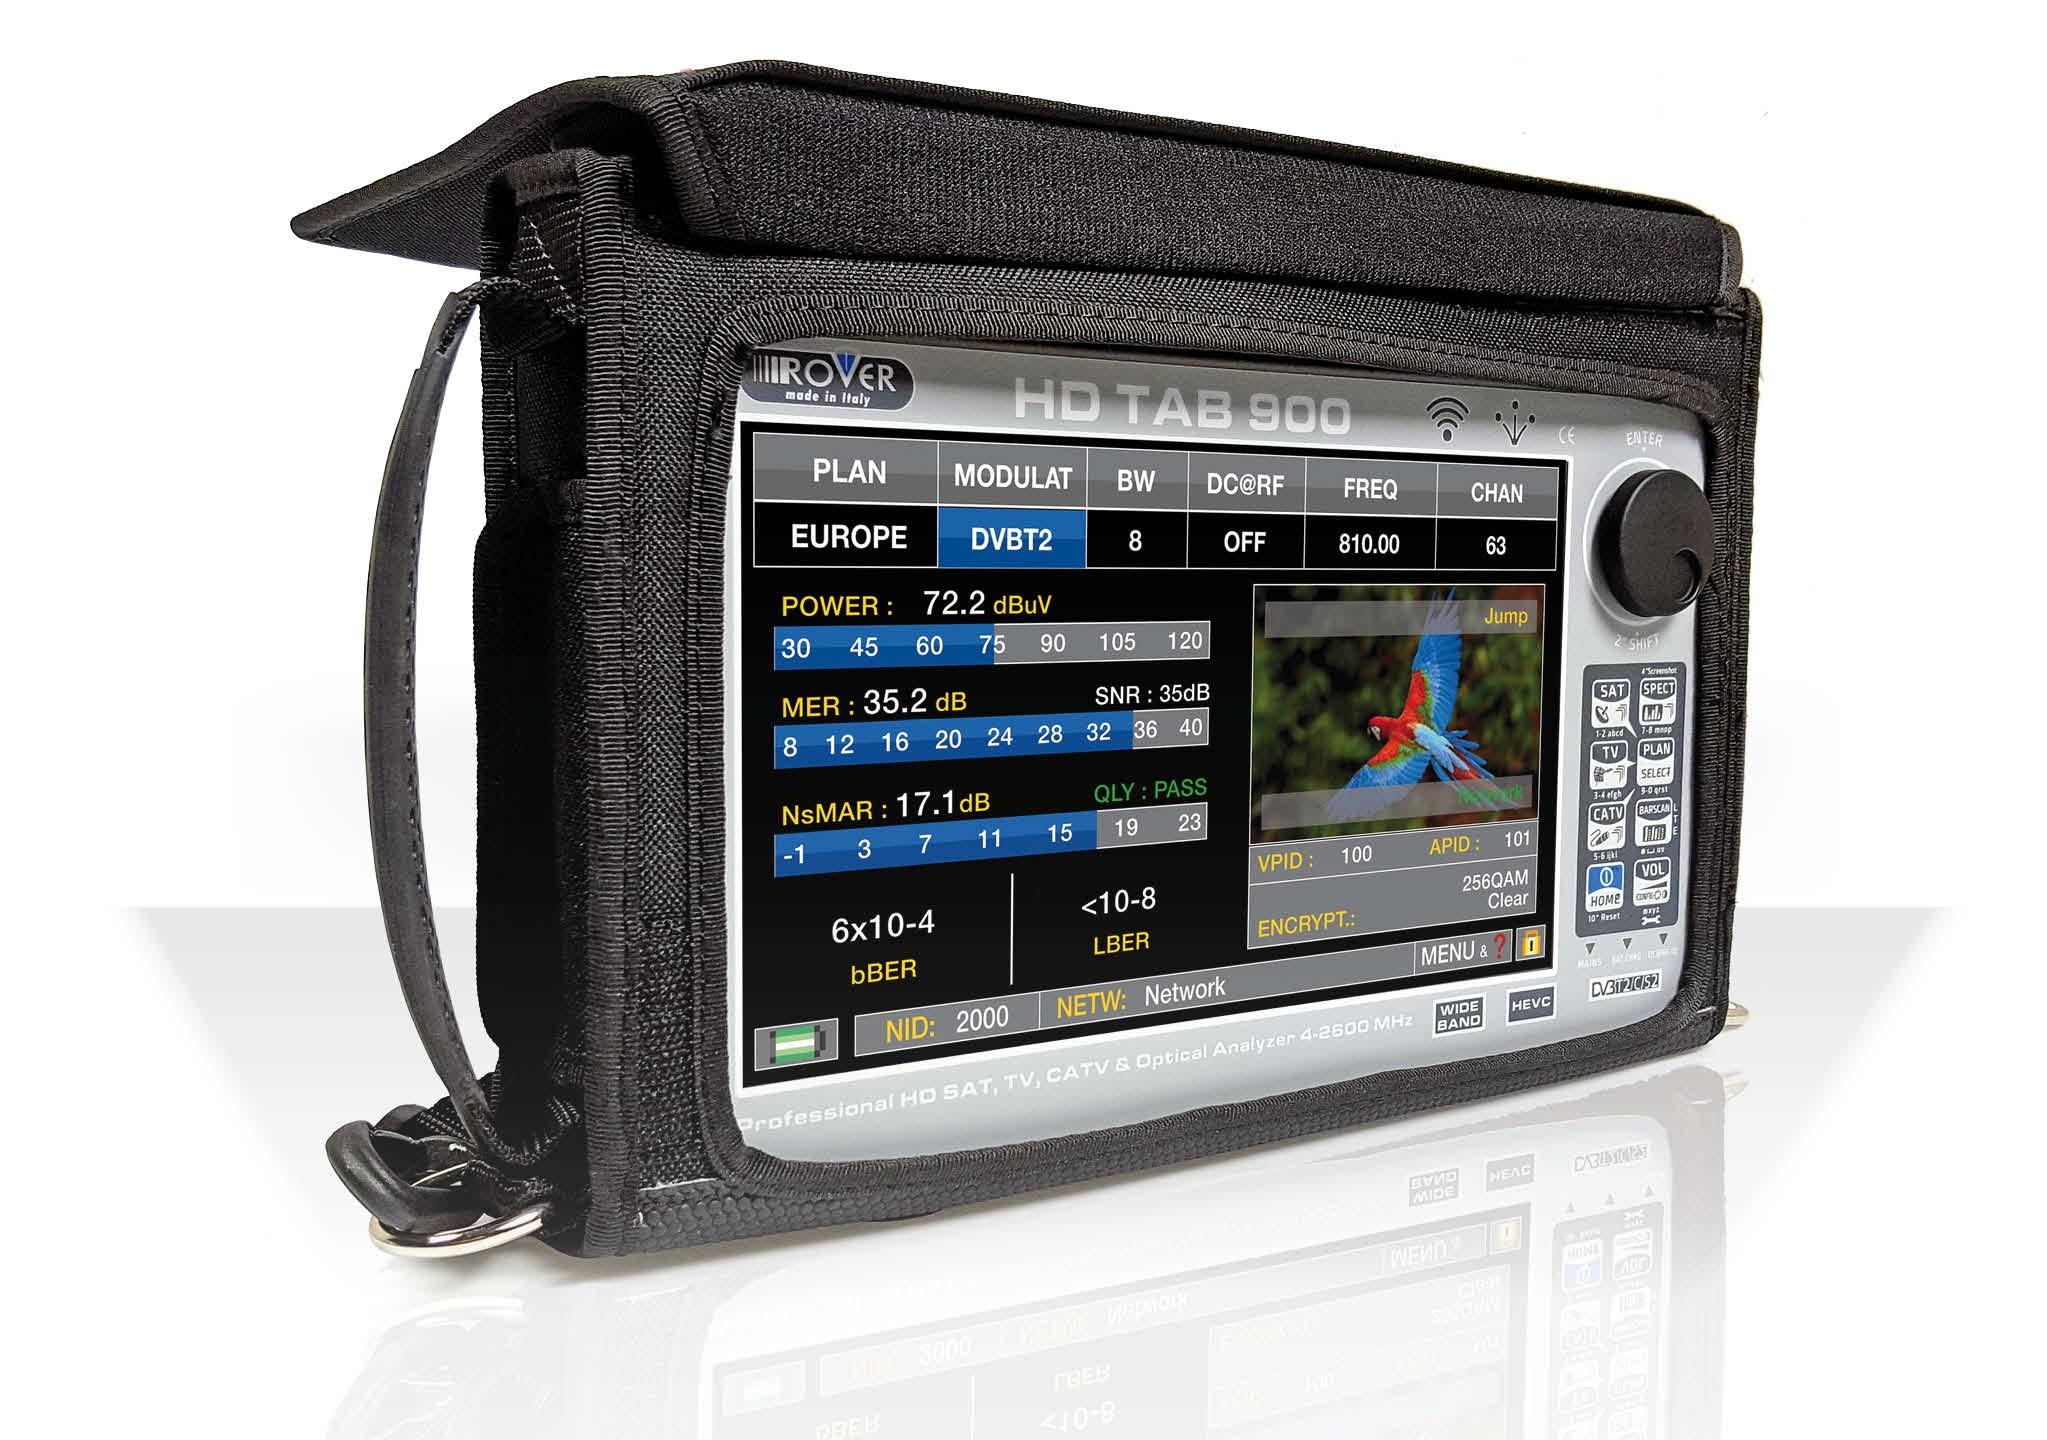 560HDTAB900-PLUS